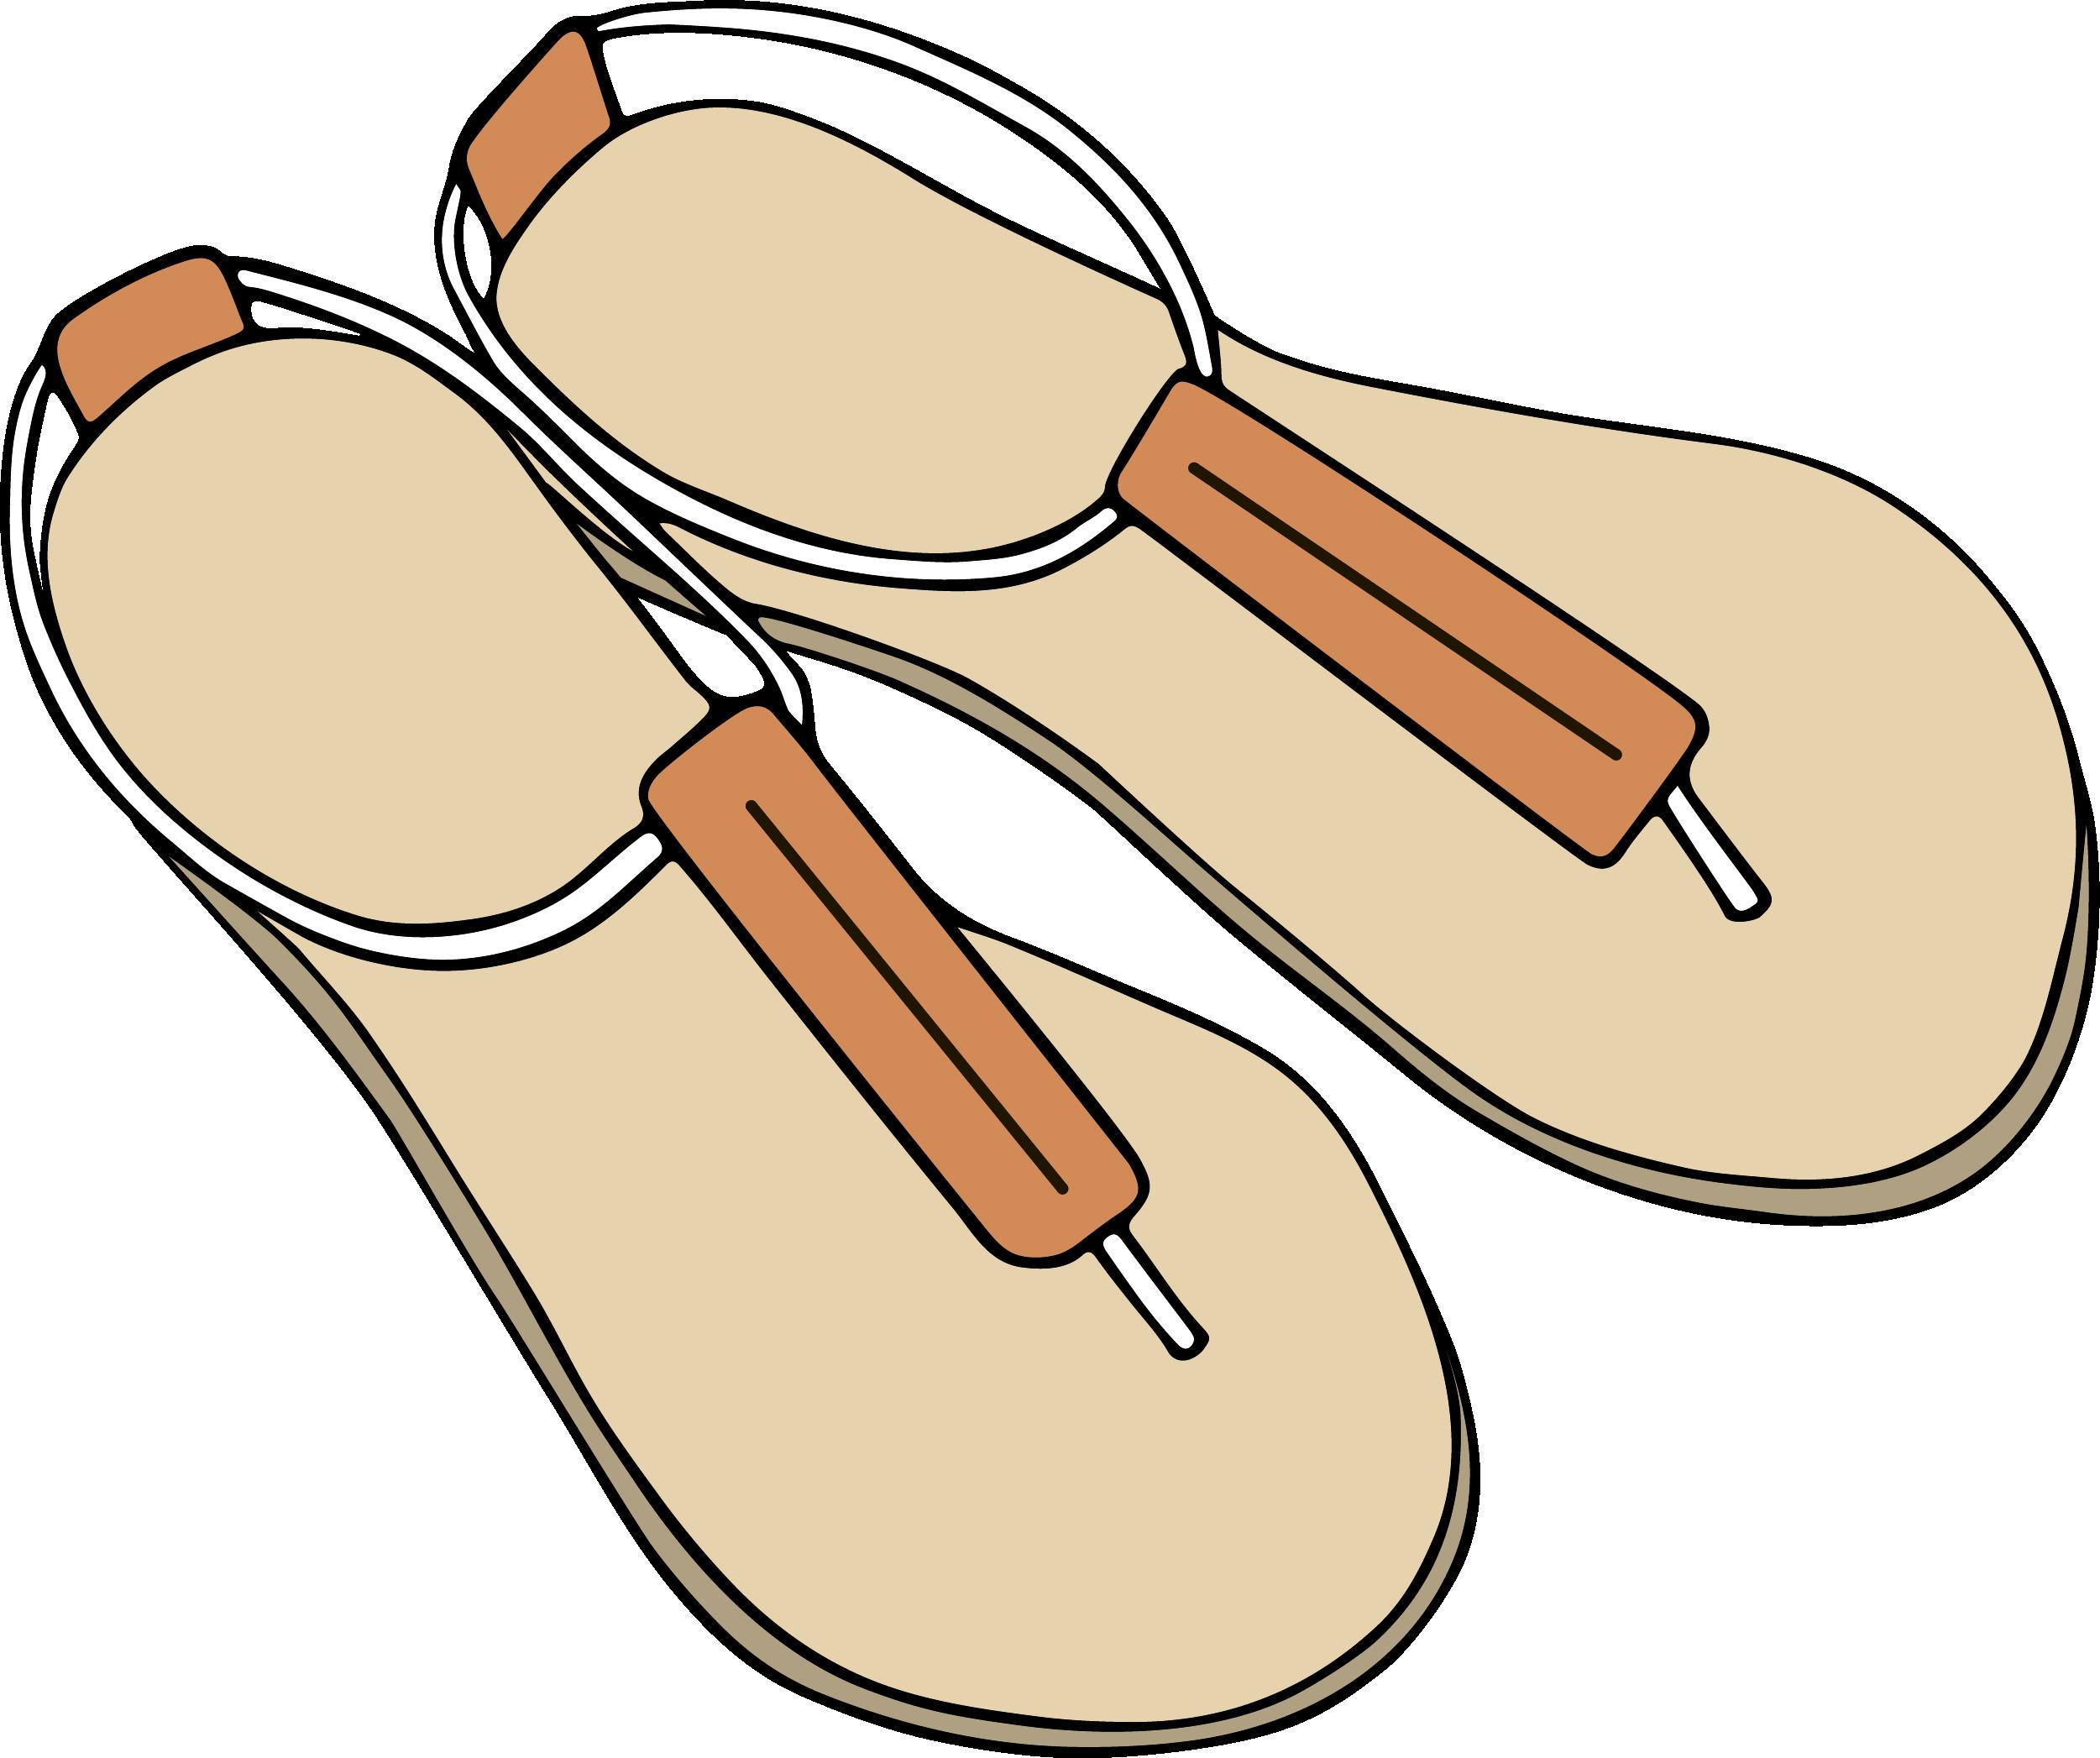 Sandal drawing clip art. Clipart walking cartoon